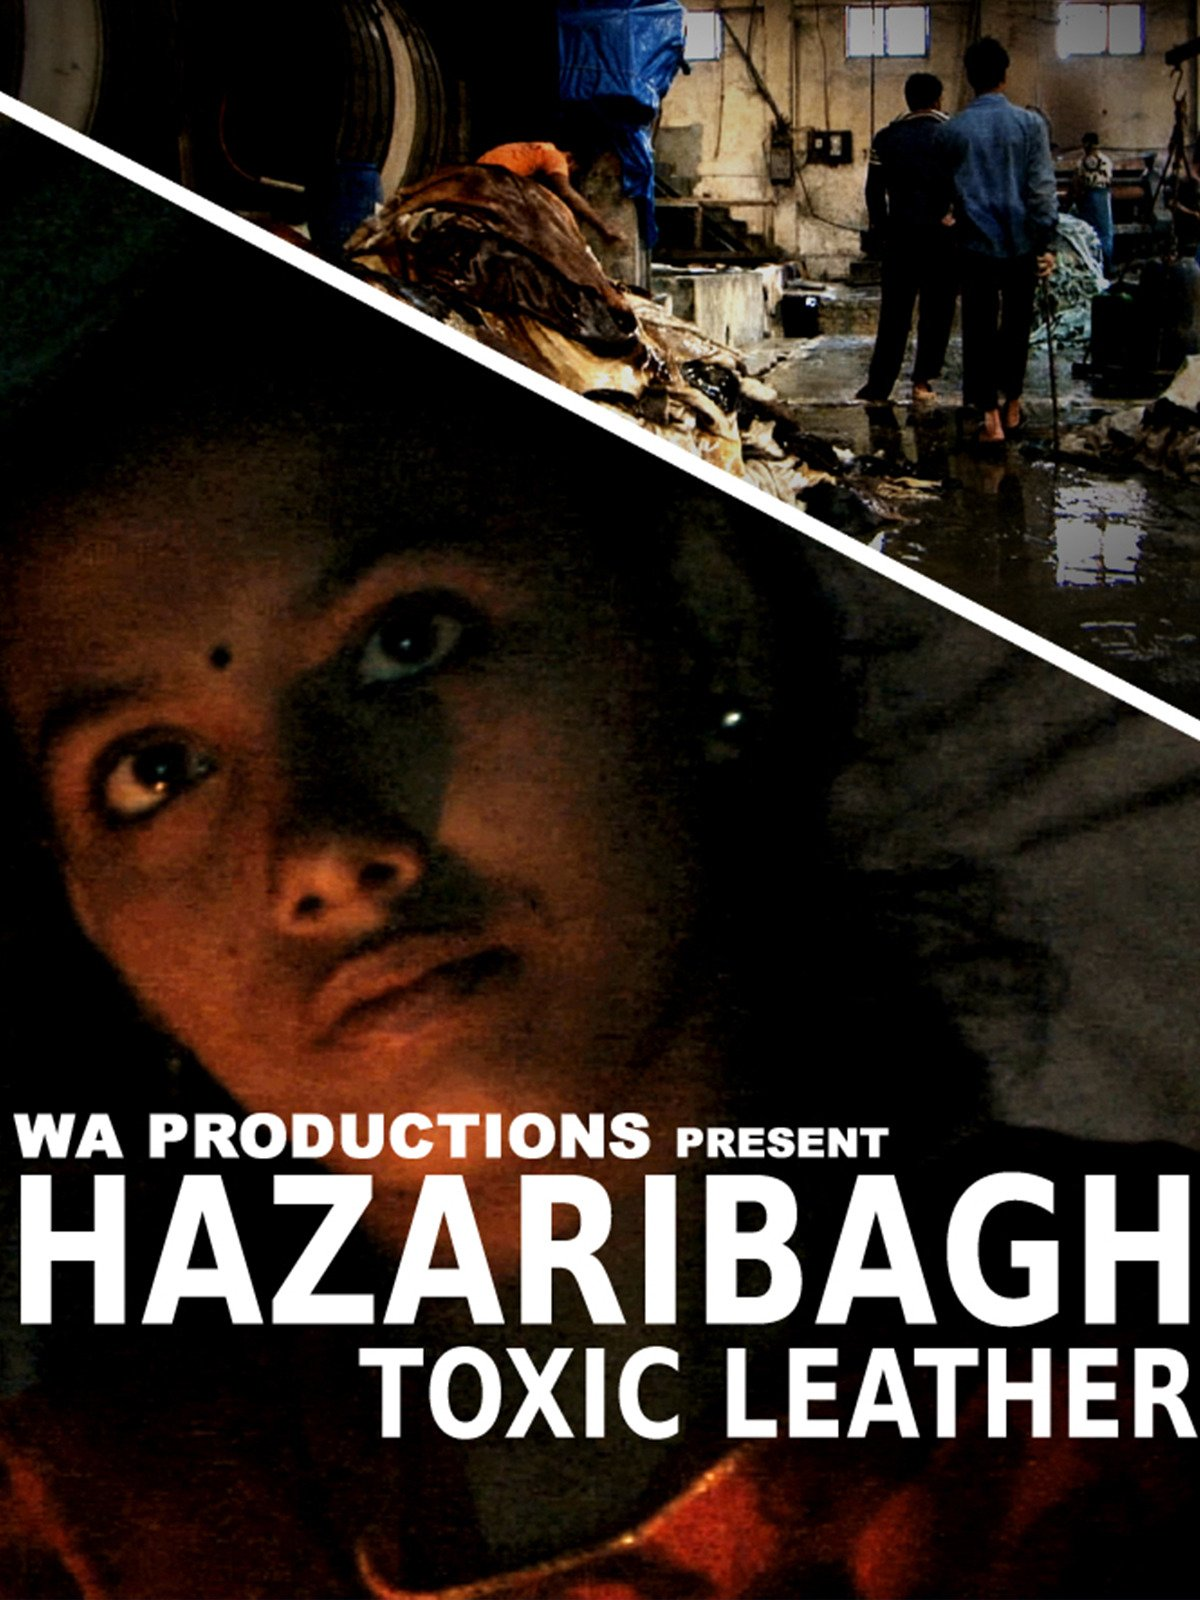 Hazaribagh: Toxic Leather